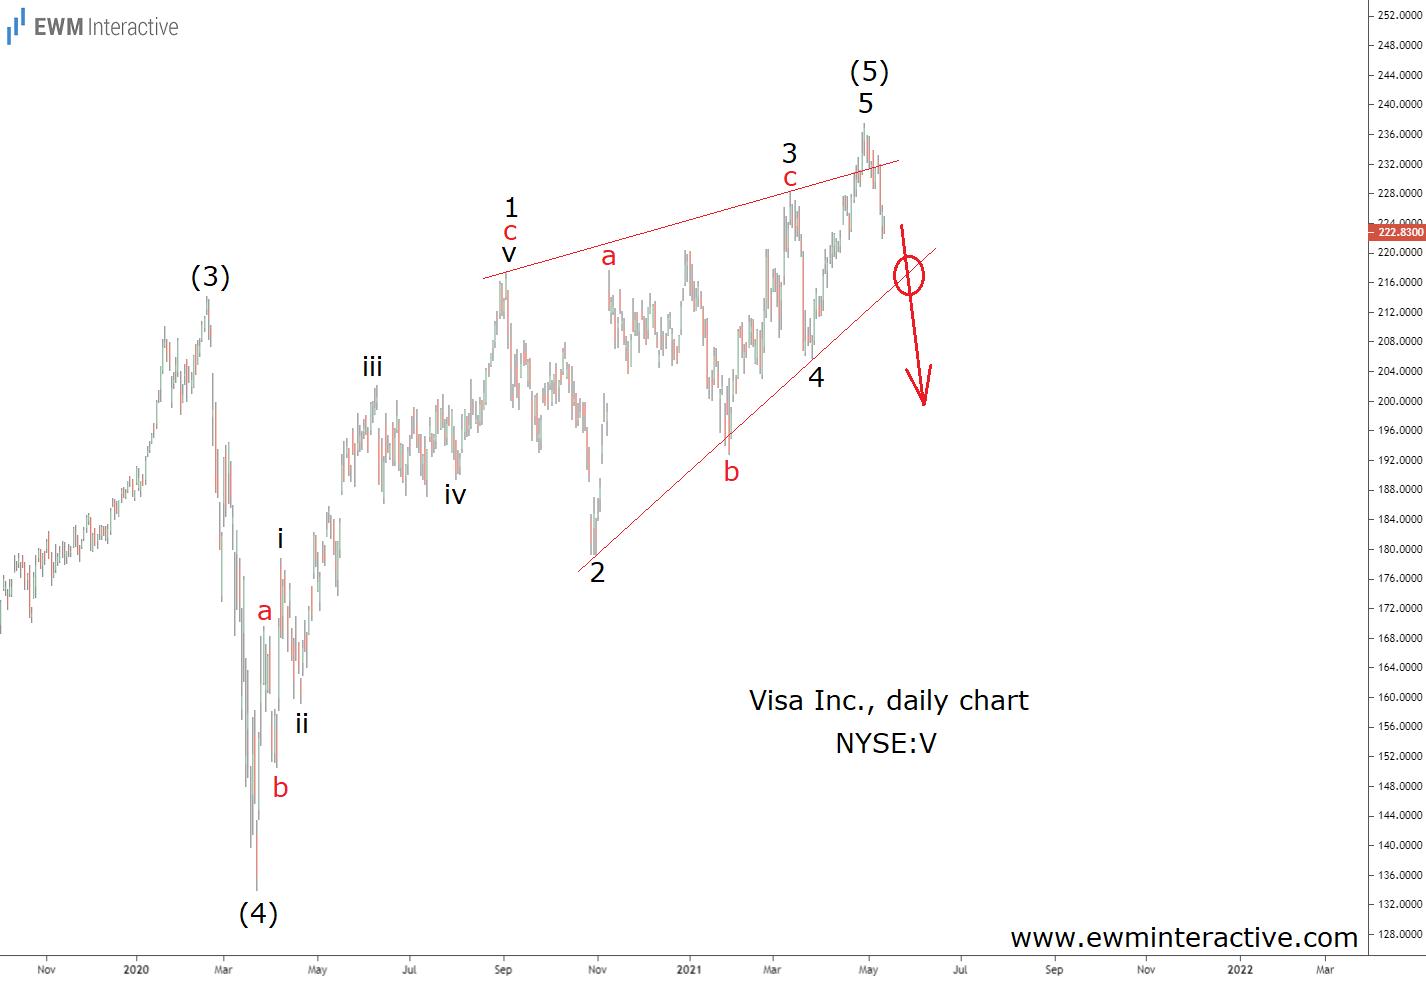 Visa stock draws an ending diagonal Elliott Wave pattern